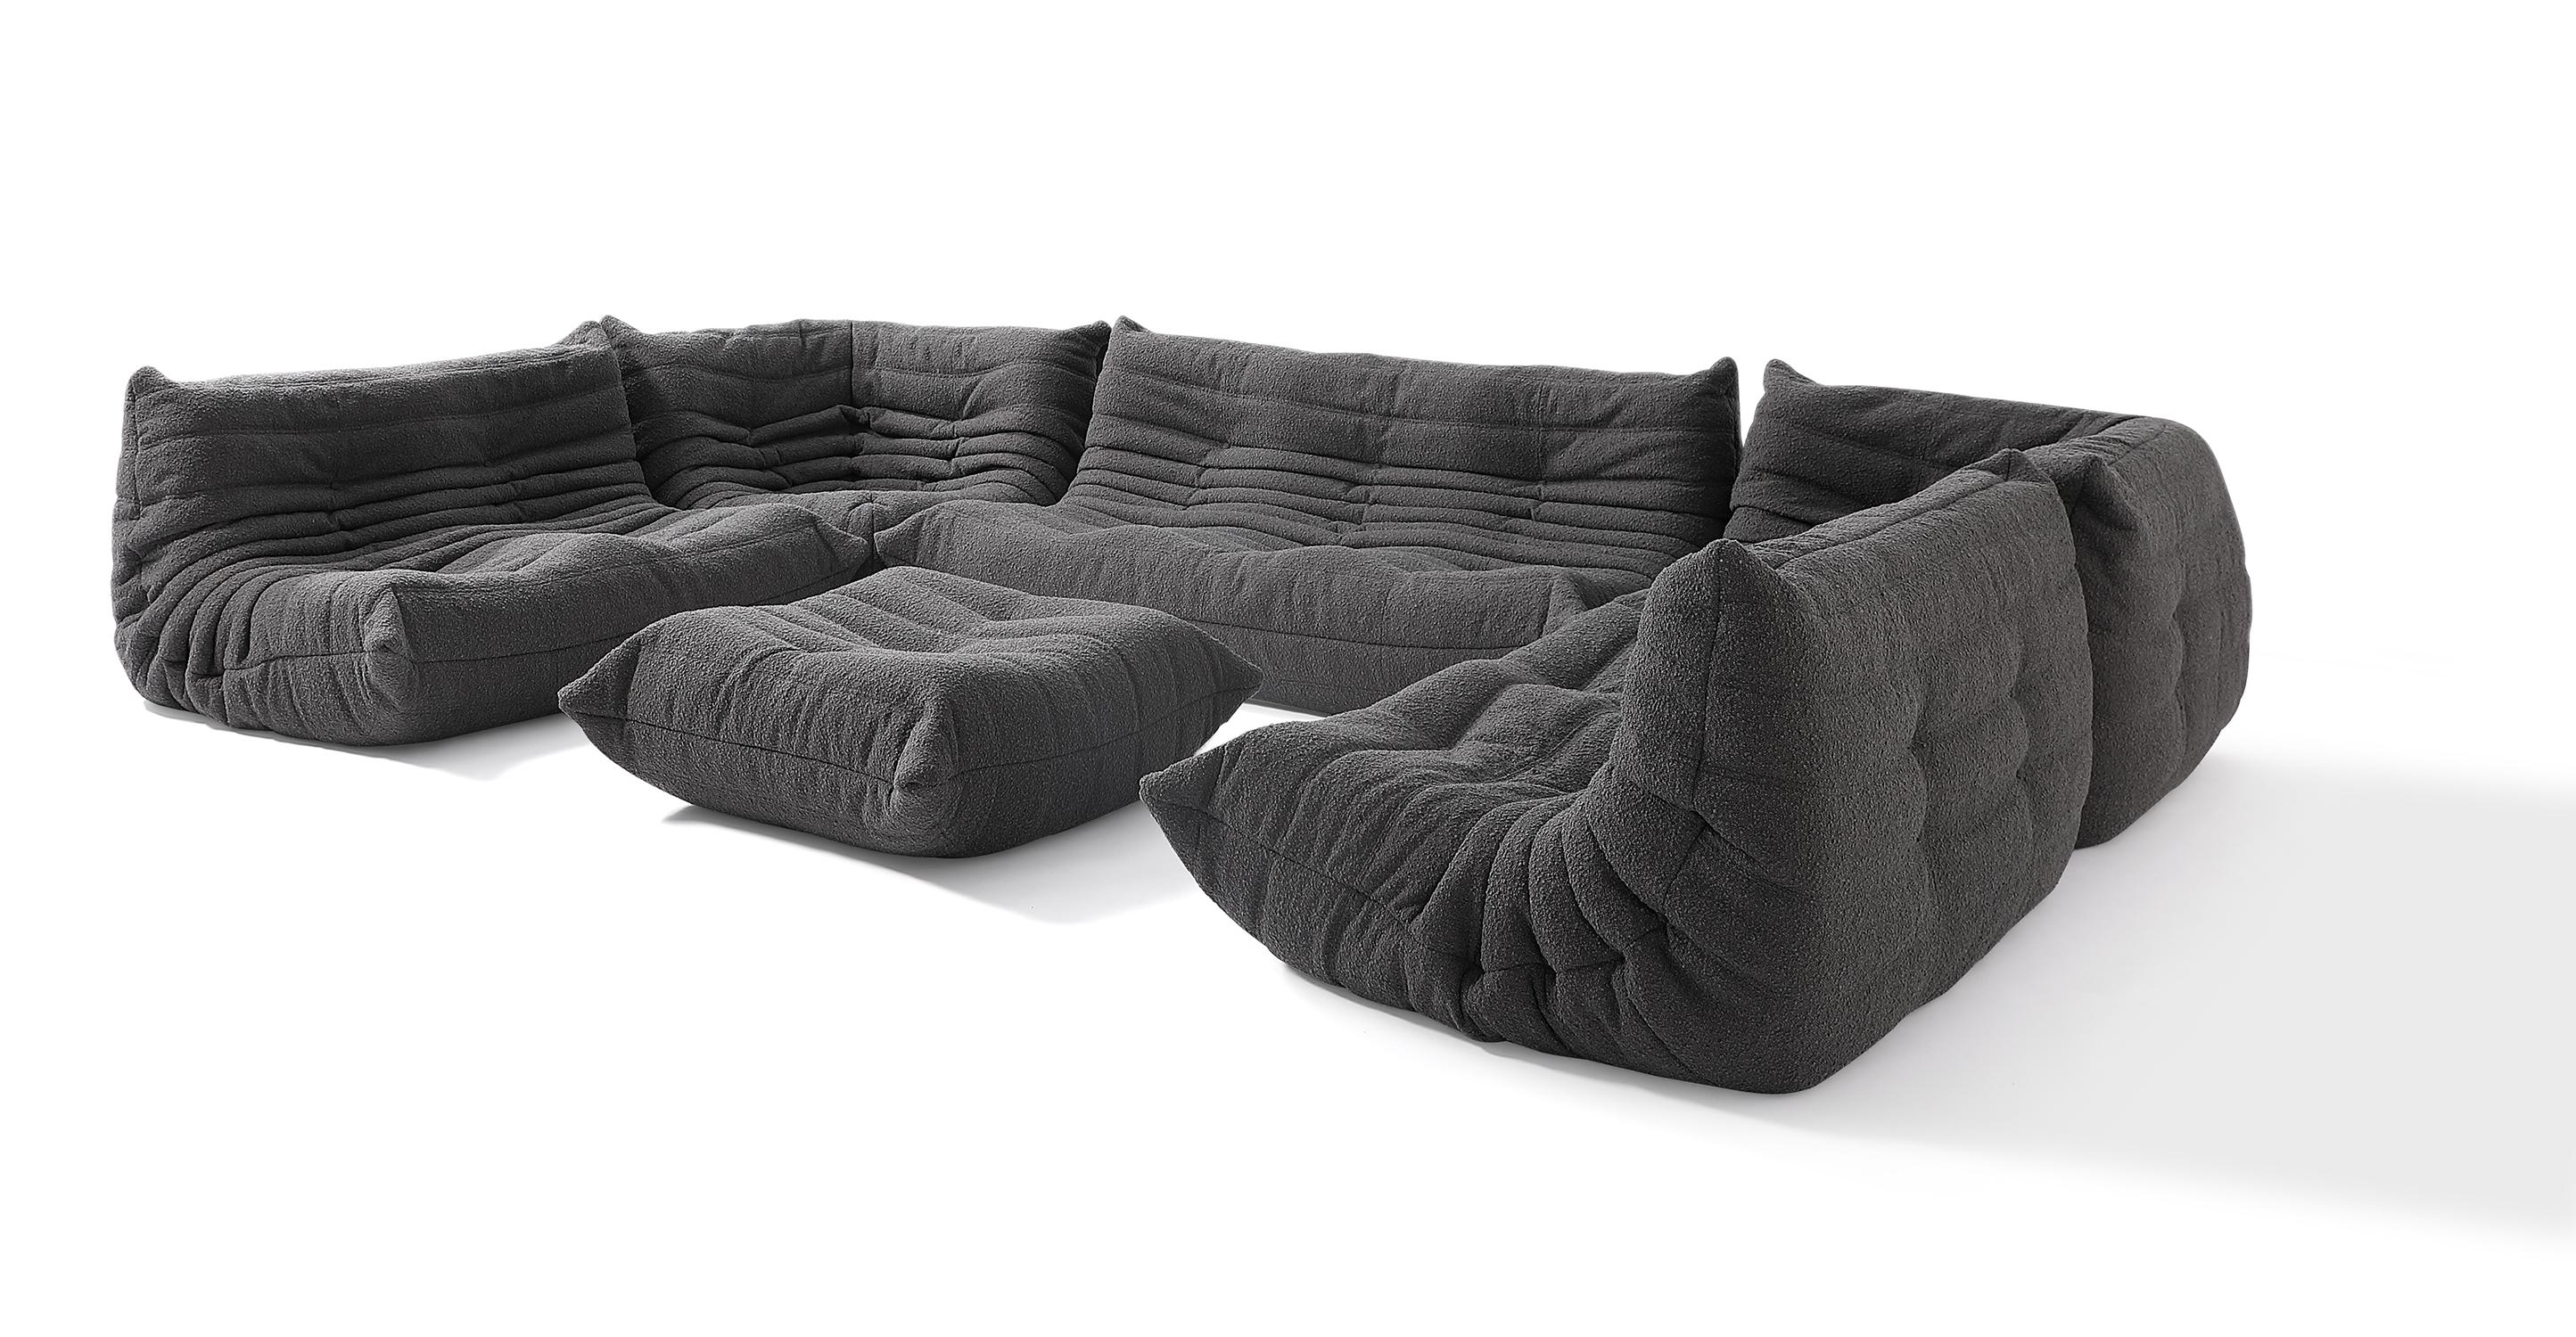 "Louvre Modular 150"" Vinci 6-pc Fabric Sofa, Gris Boucle"